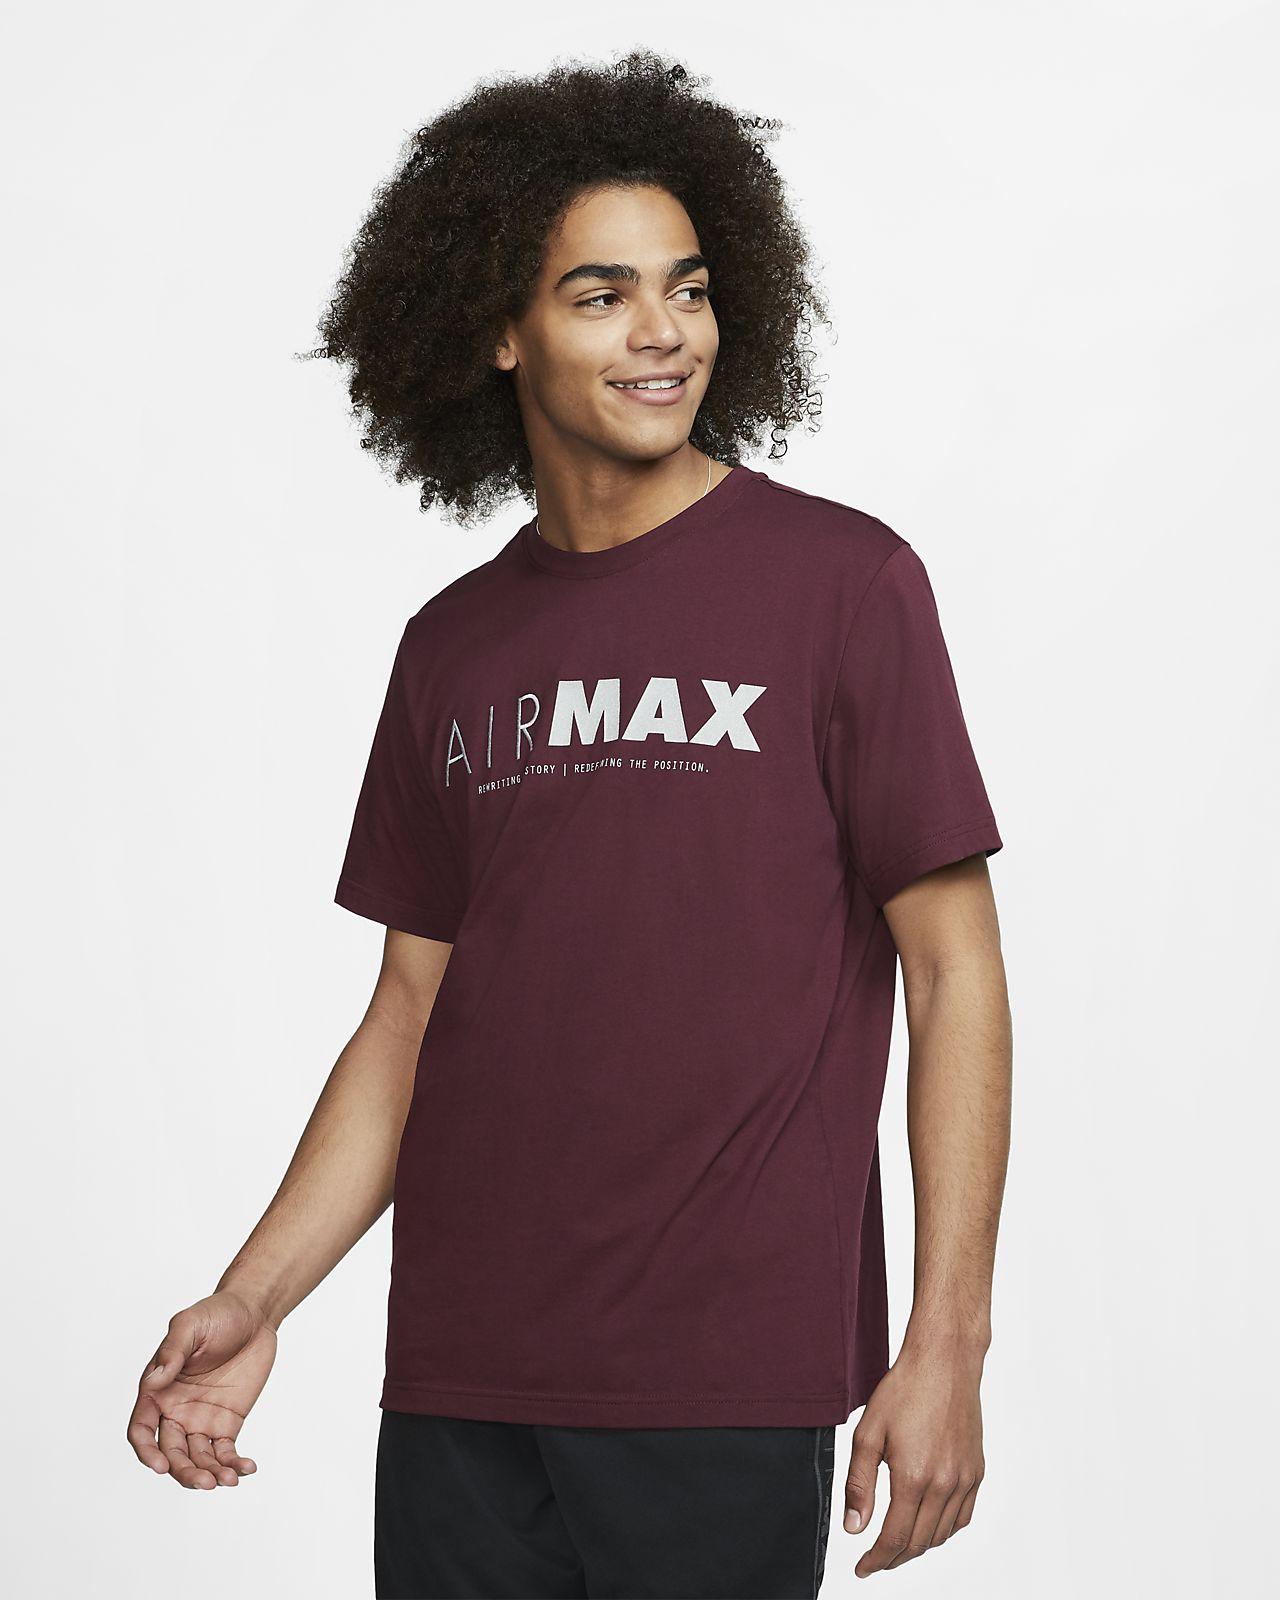 Nike Sportswear Air Max Men's Short-Sleeve Graphic T-Shirt